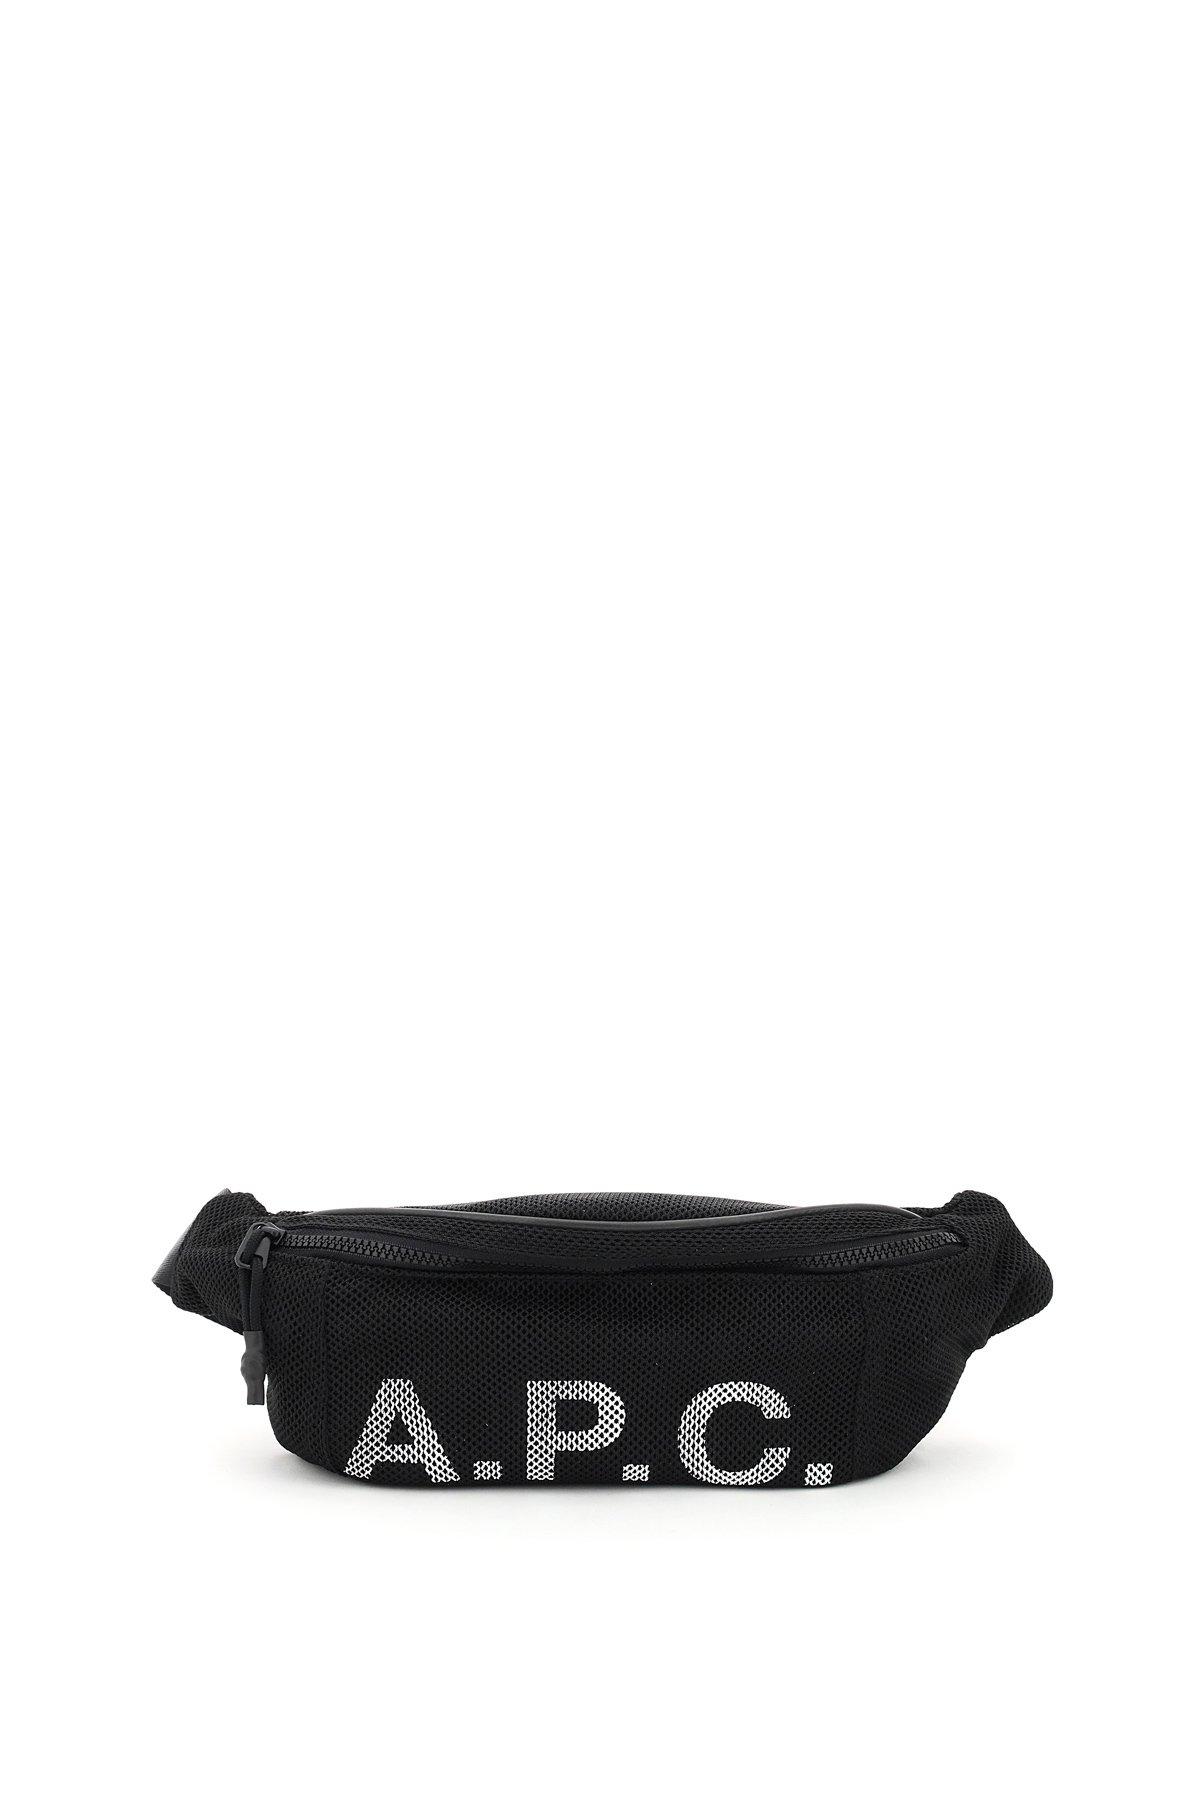 A.p.c. marsupio rebound logo